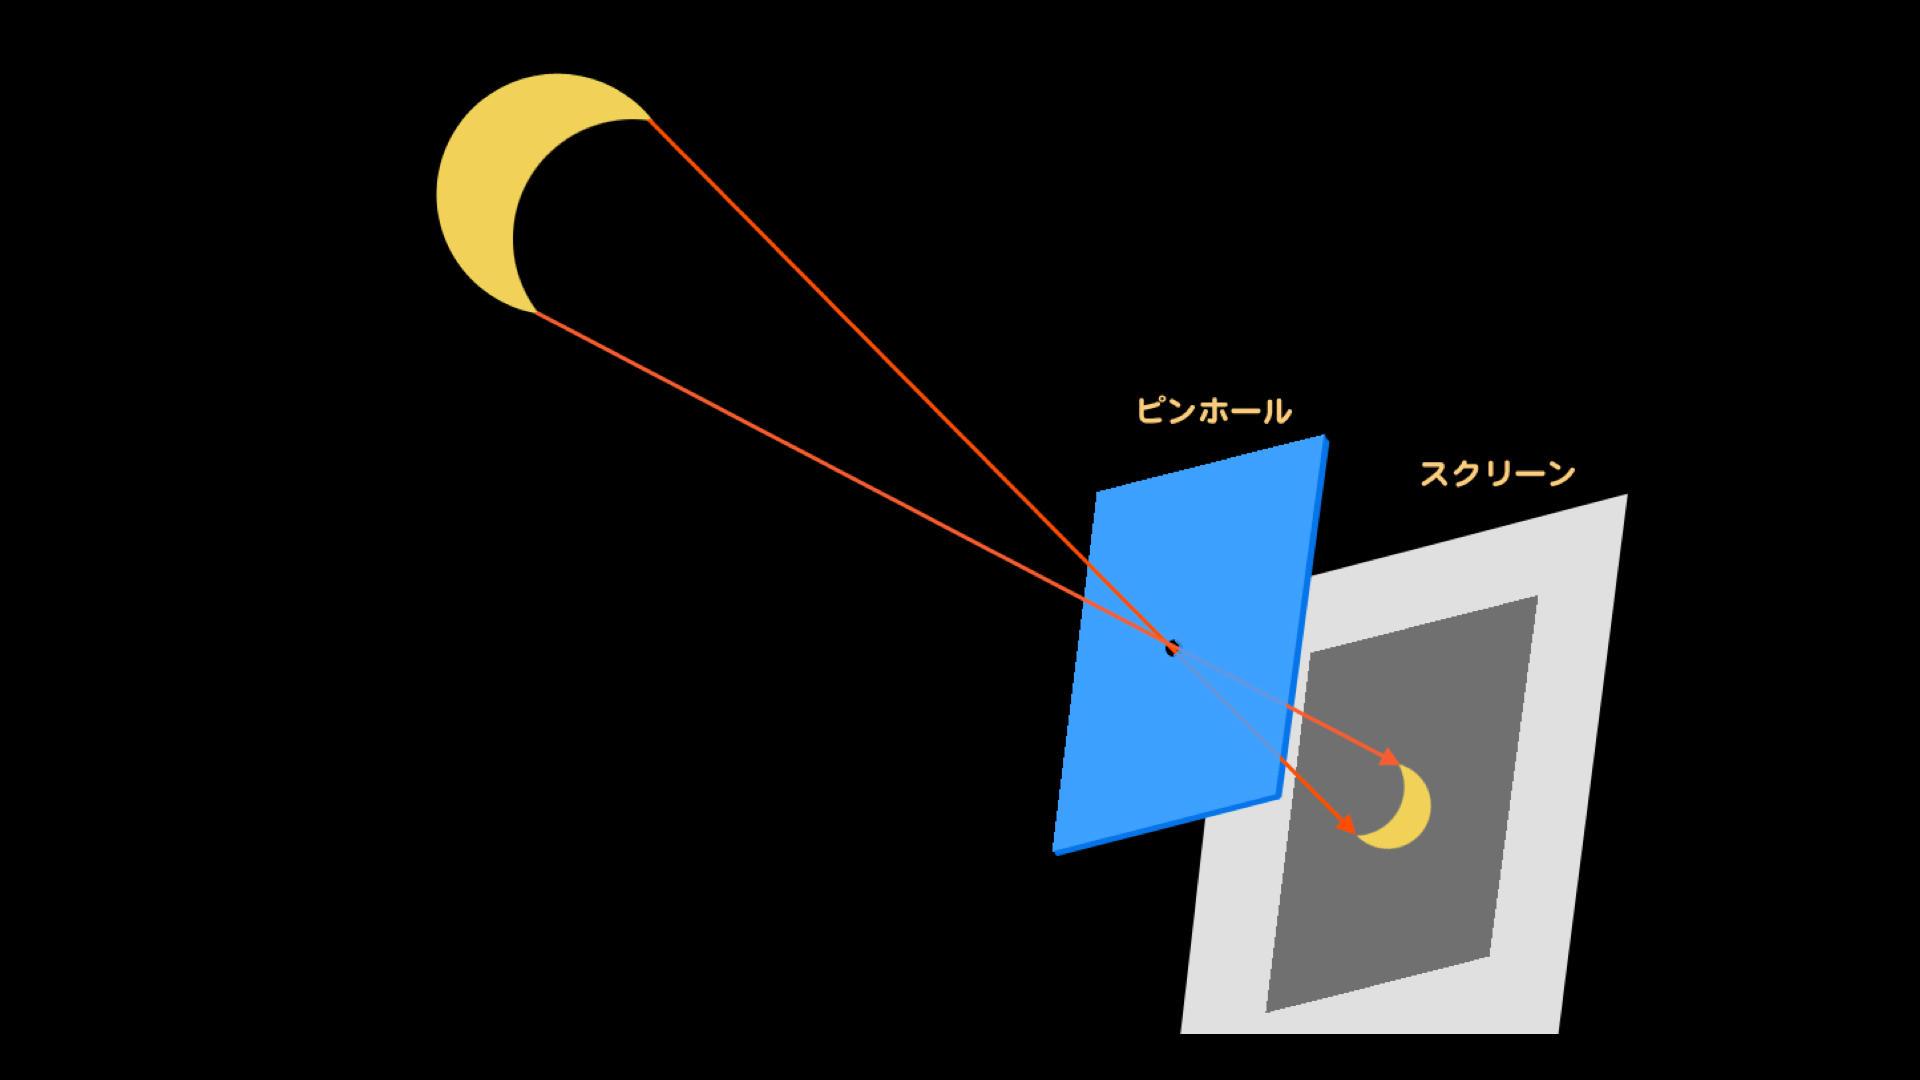 http://www.ncsm.city.nagoya.jp/study/astro/M_12-04IP.051.jpg